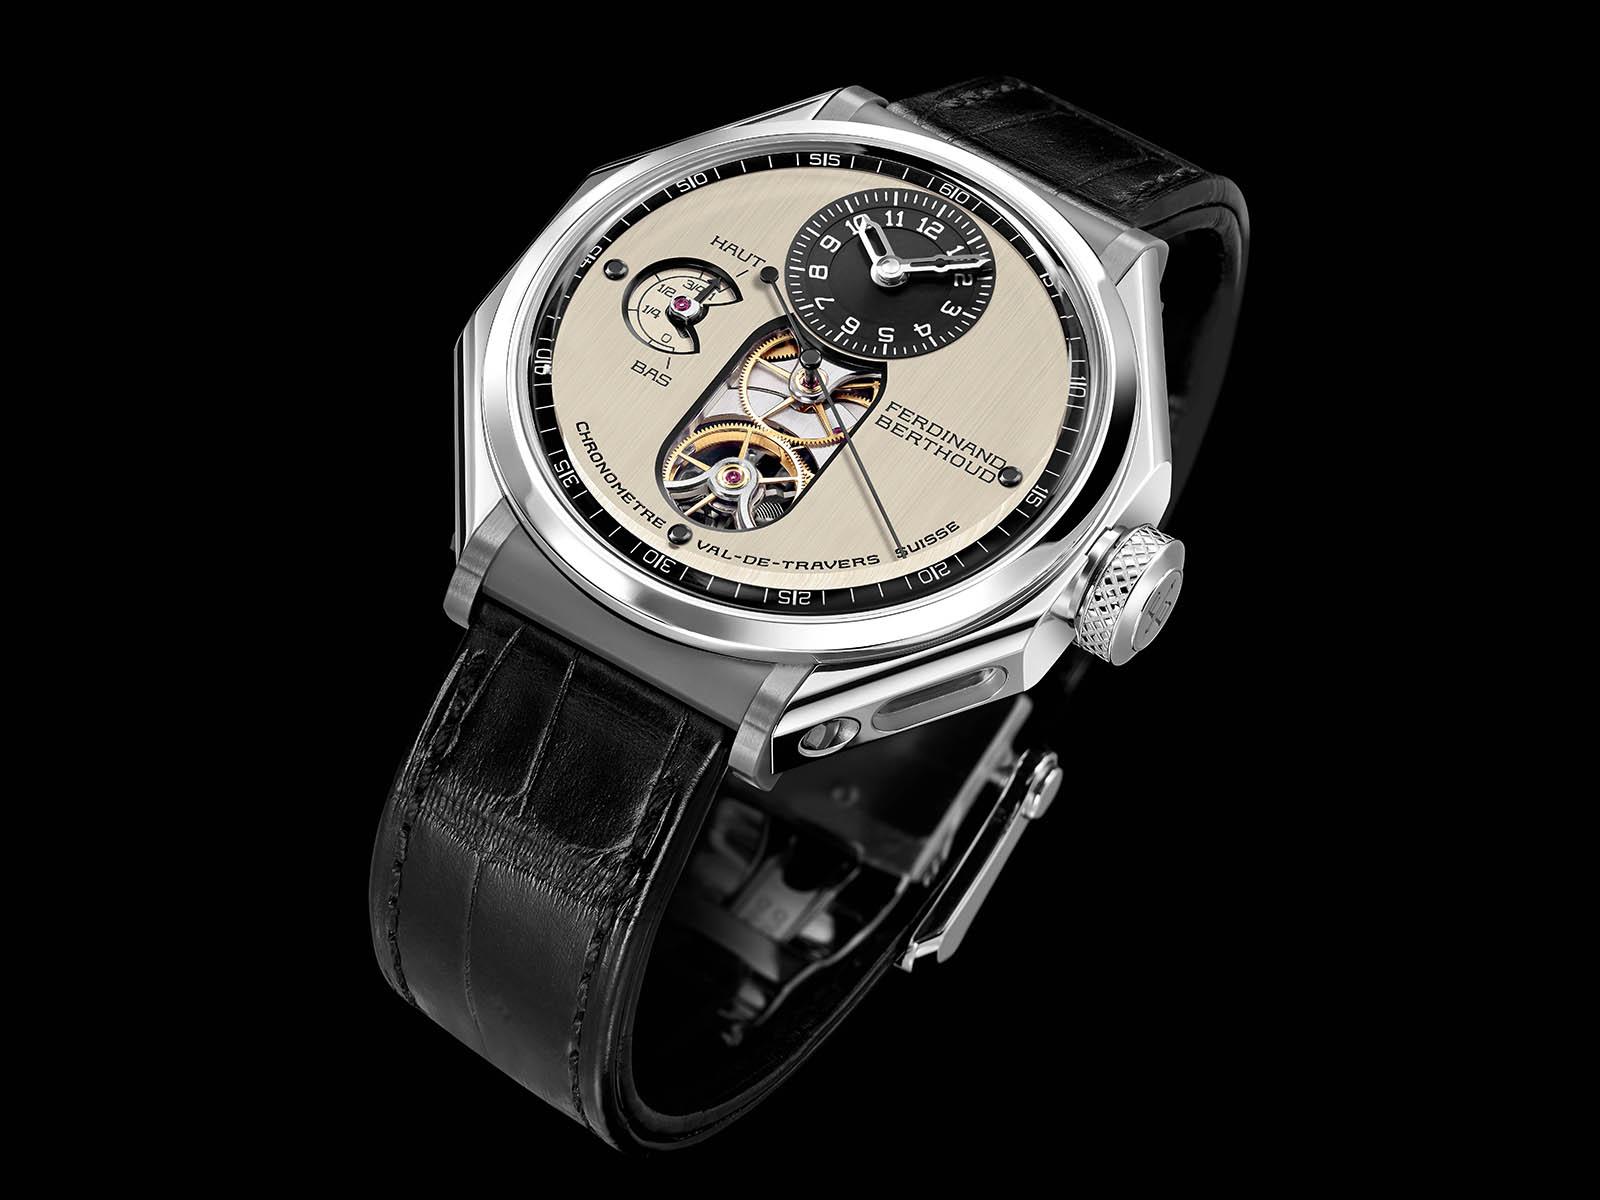 Chronometrie-Ferdinand-Berthoud-FB-1-3-1.jpg